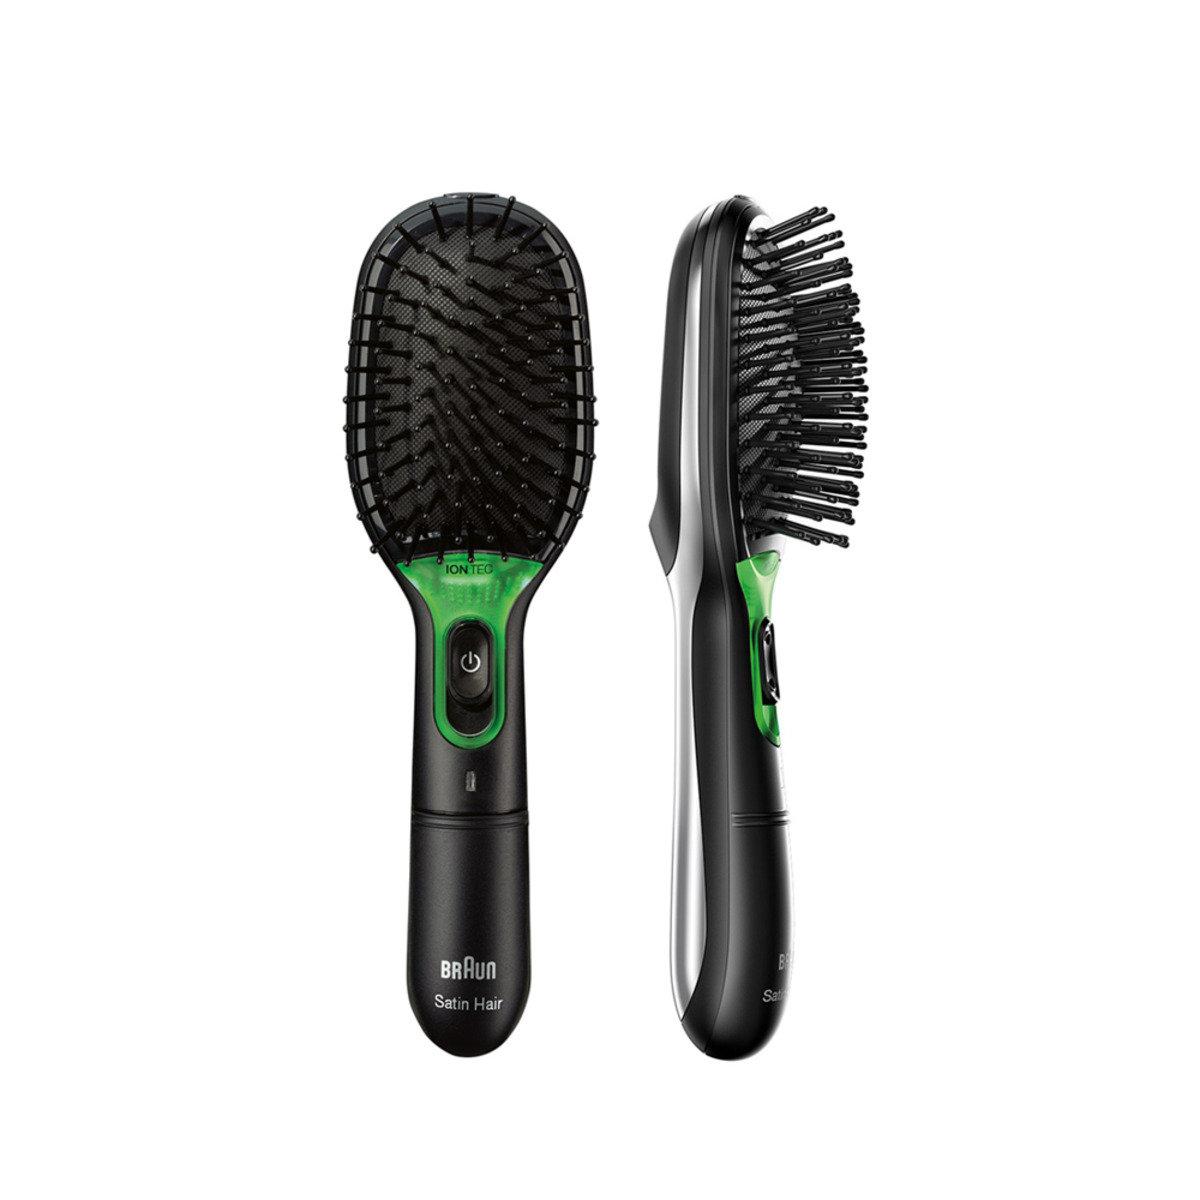 Braun Satin Hair 7 Iontec Brush Br710 Hktvmall Online